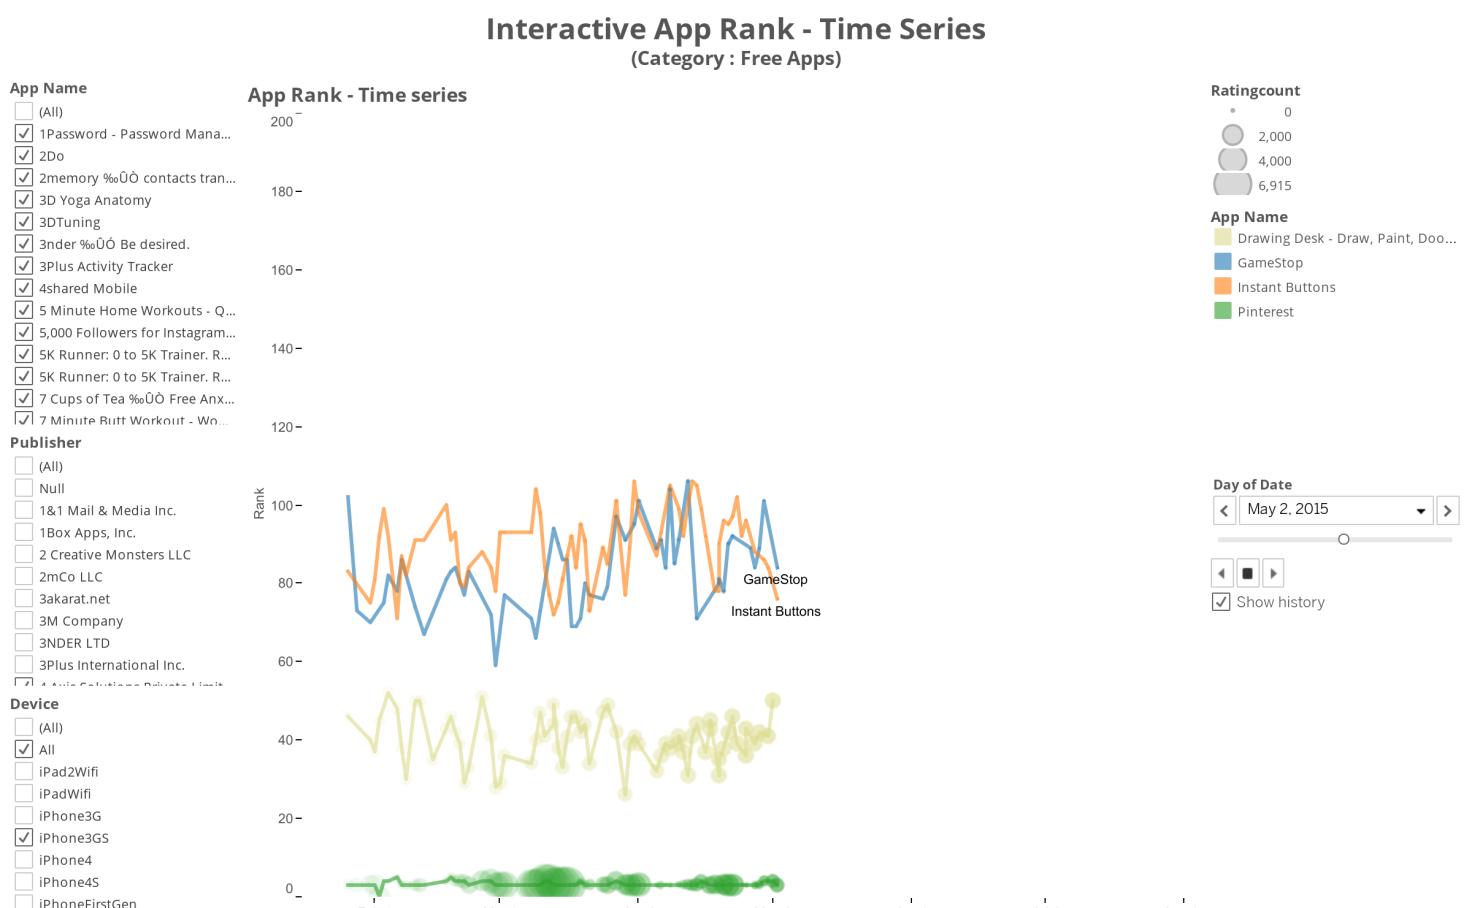 Interactive Time series - App Rank - Ashish Soni | Tableau Public